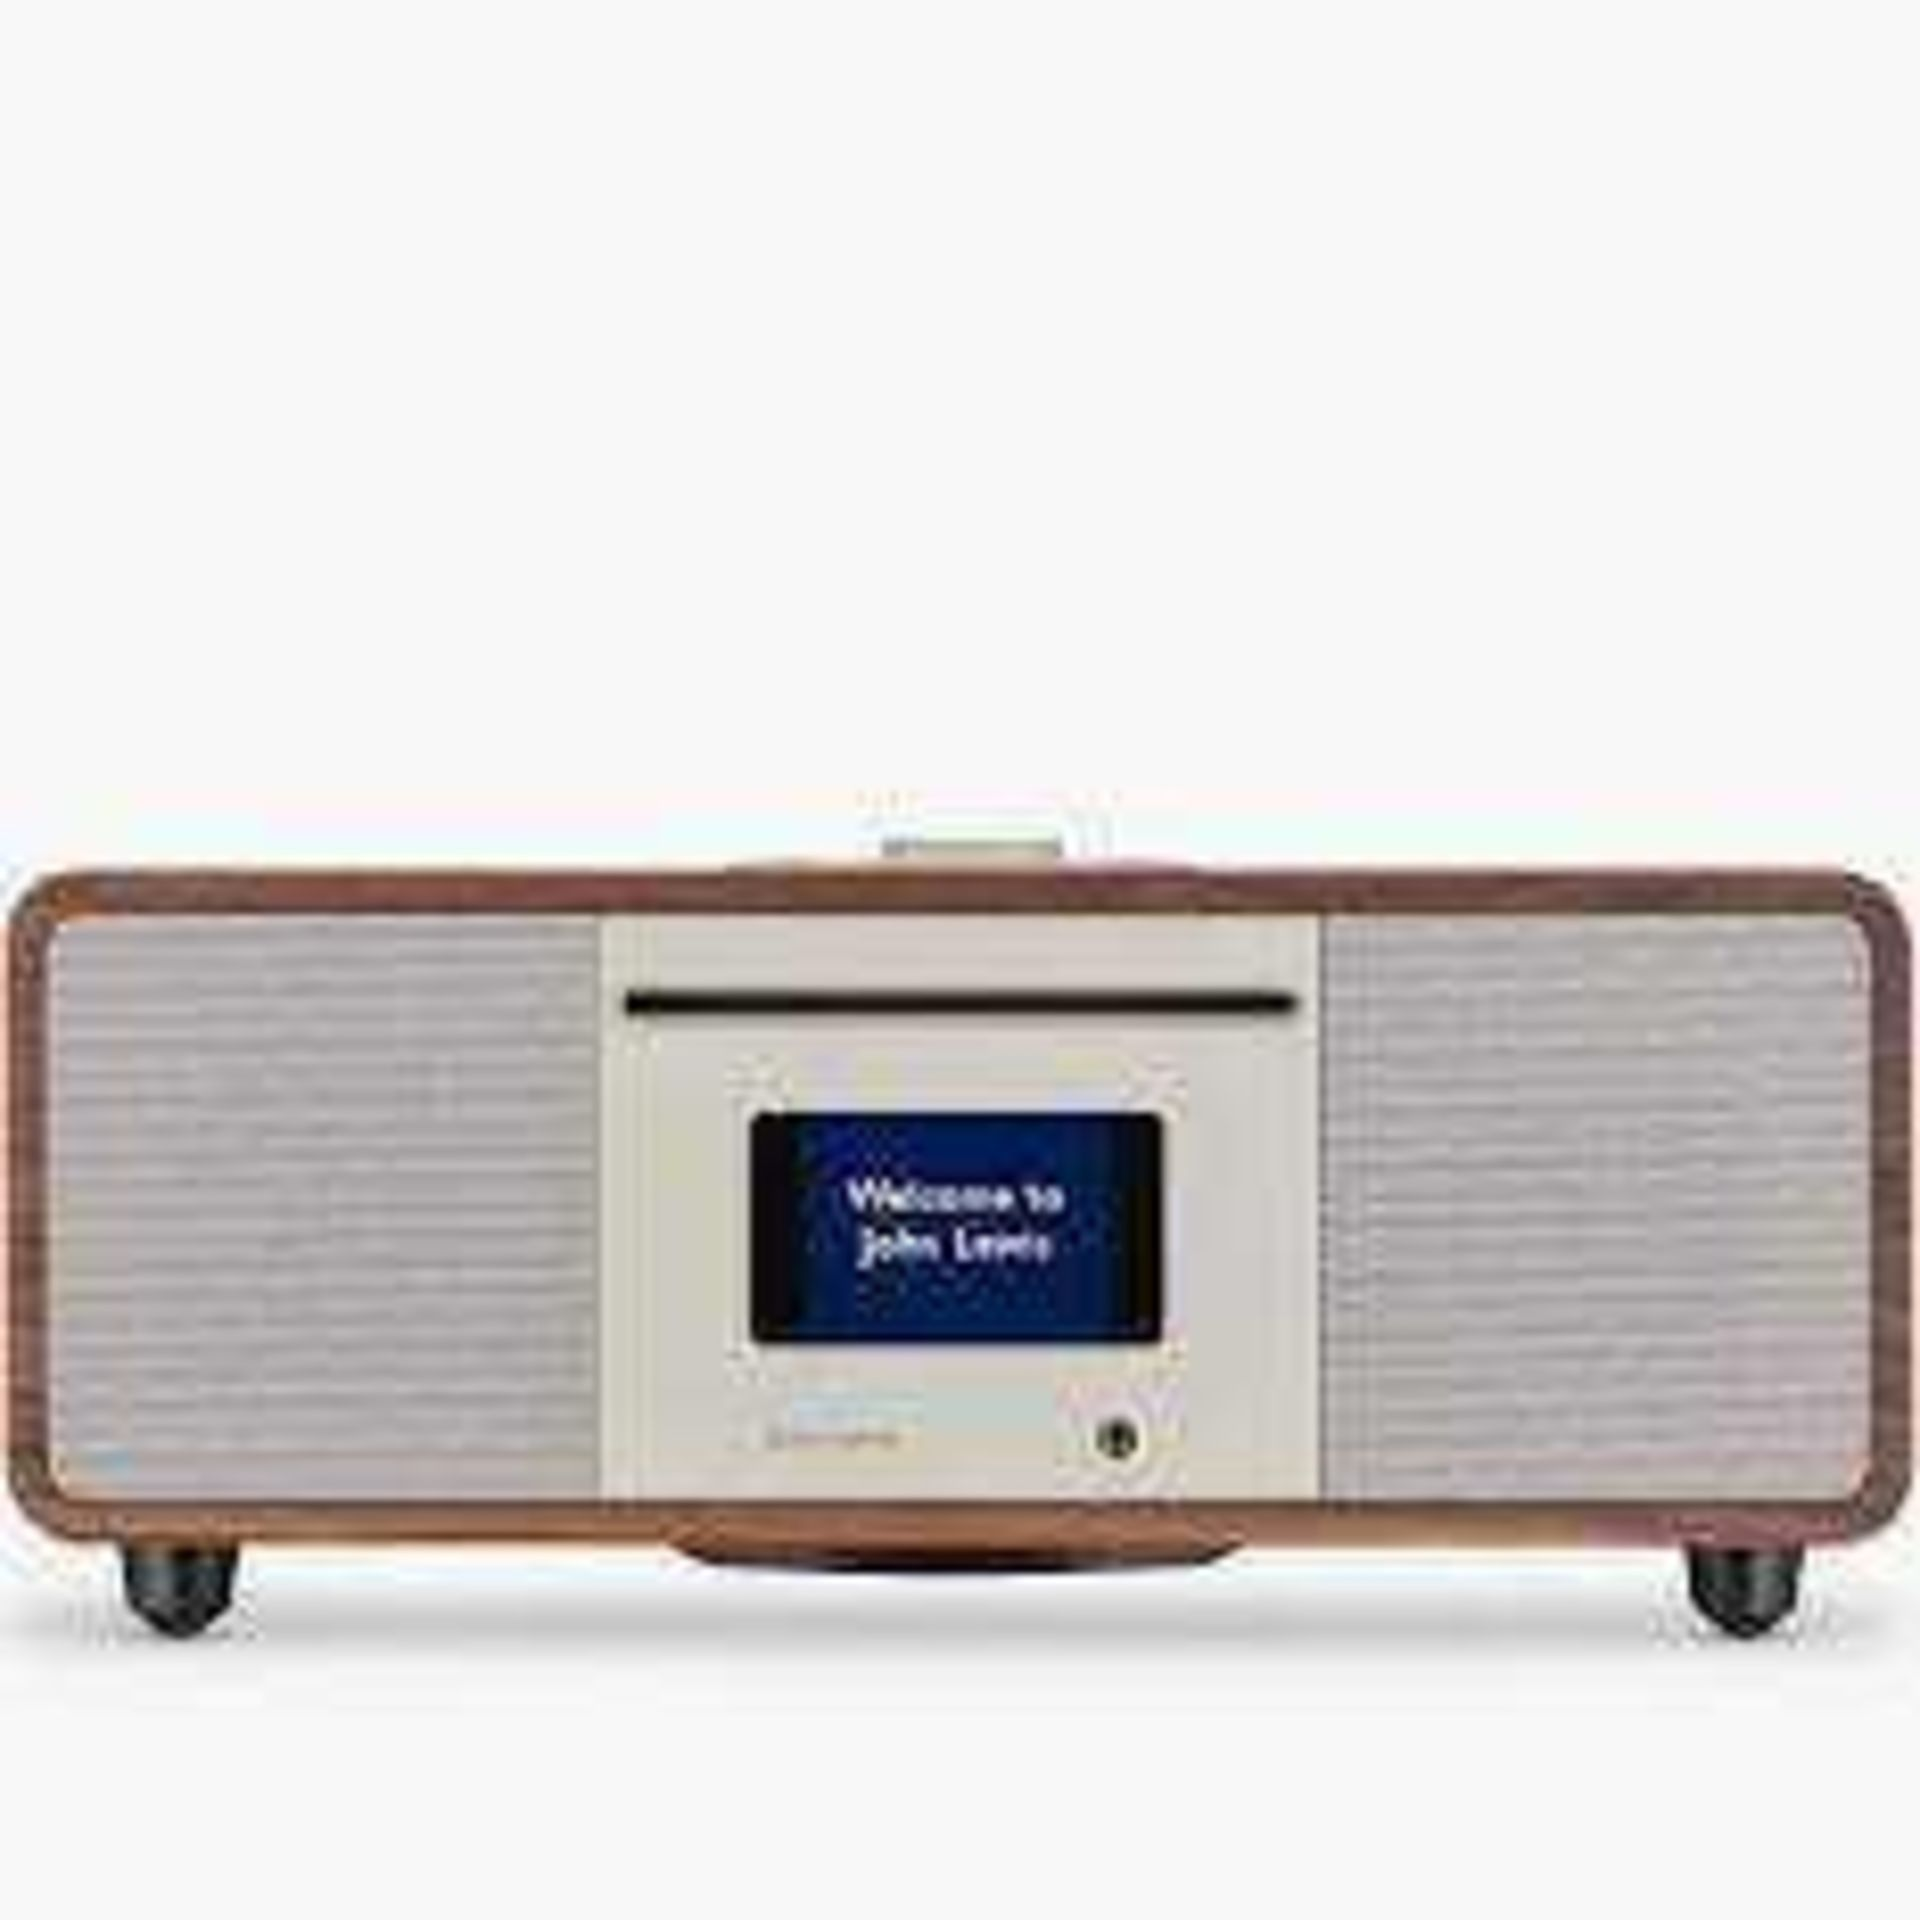 RRP £200 Unboxed John Lewis Octave Dab Fm Digital Radio